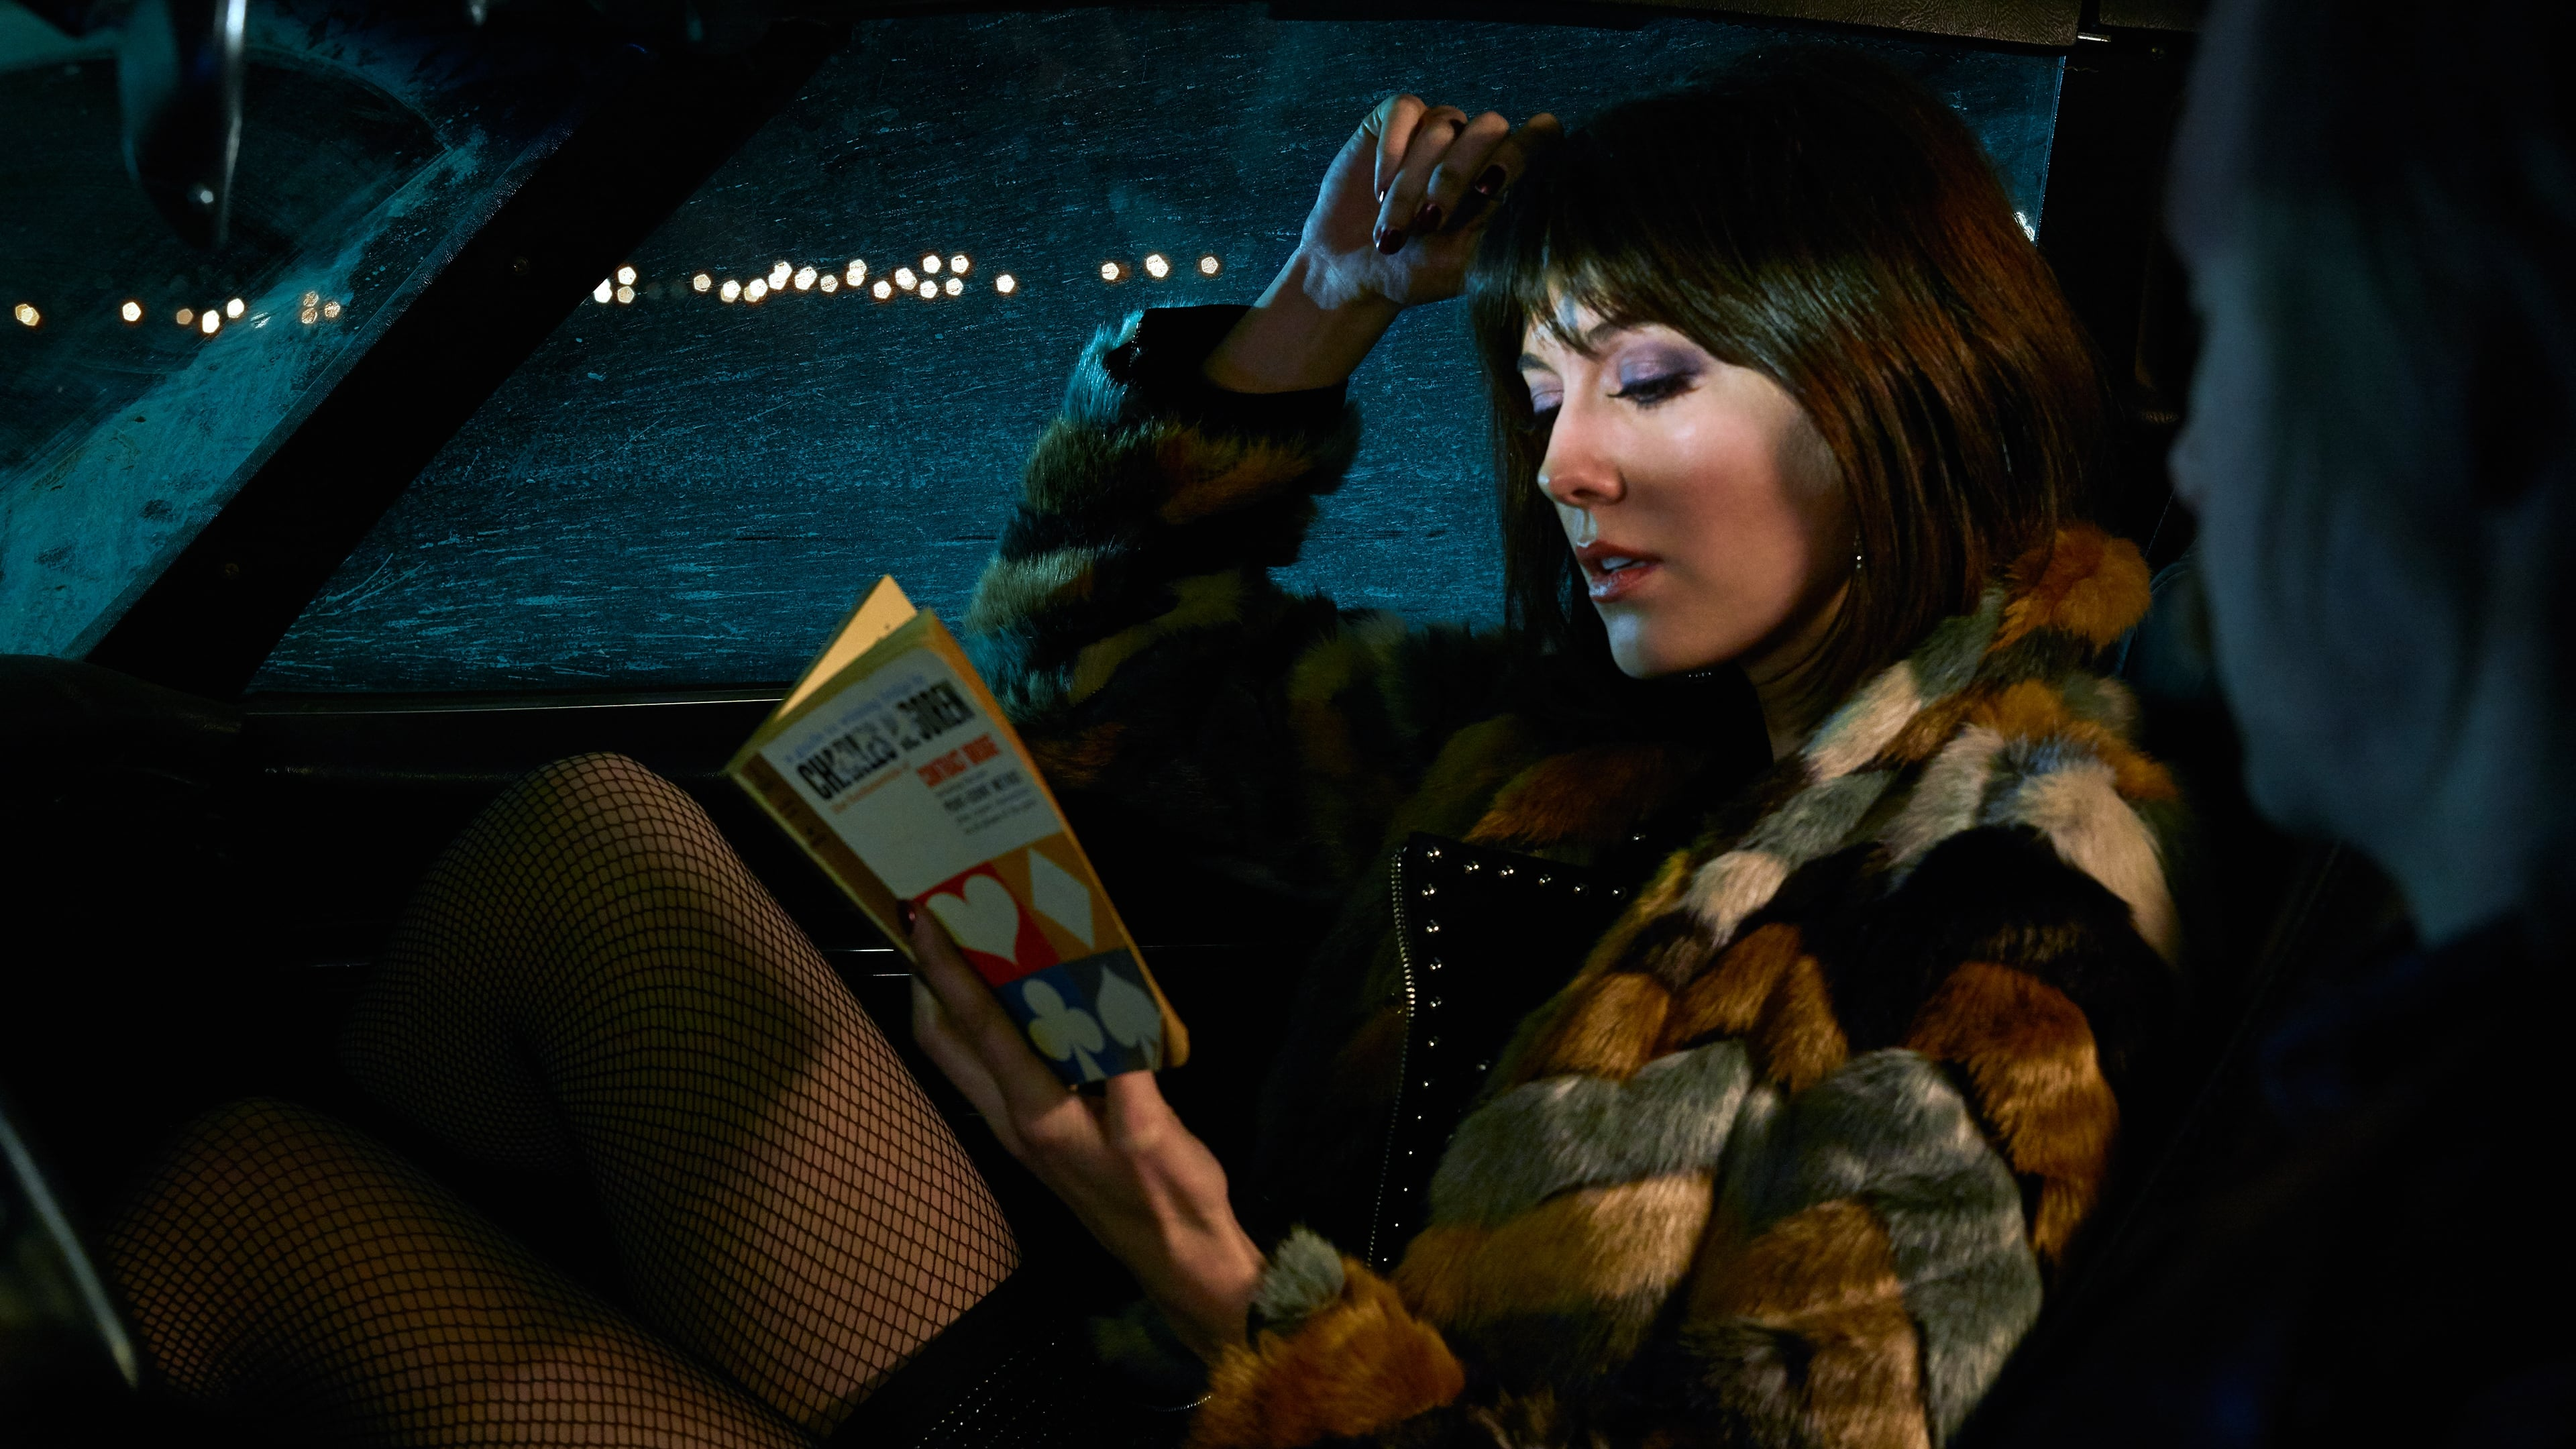 'Fargo' on Netflix from April